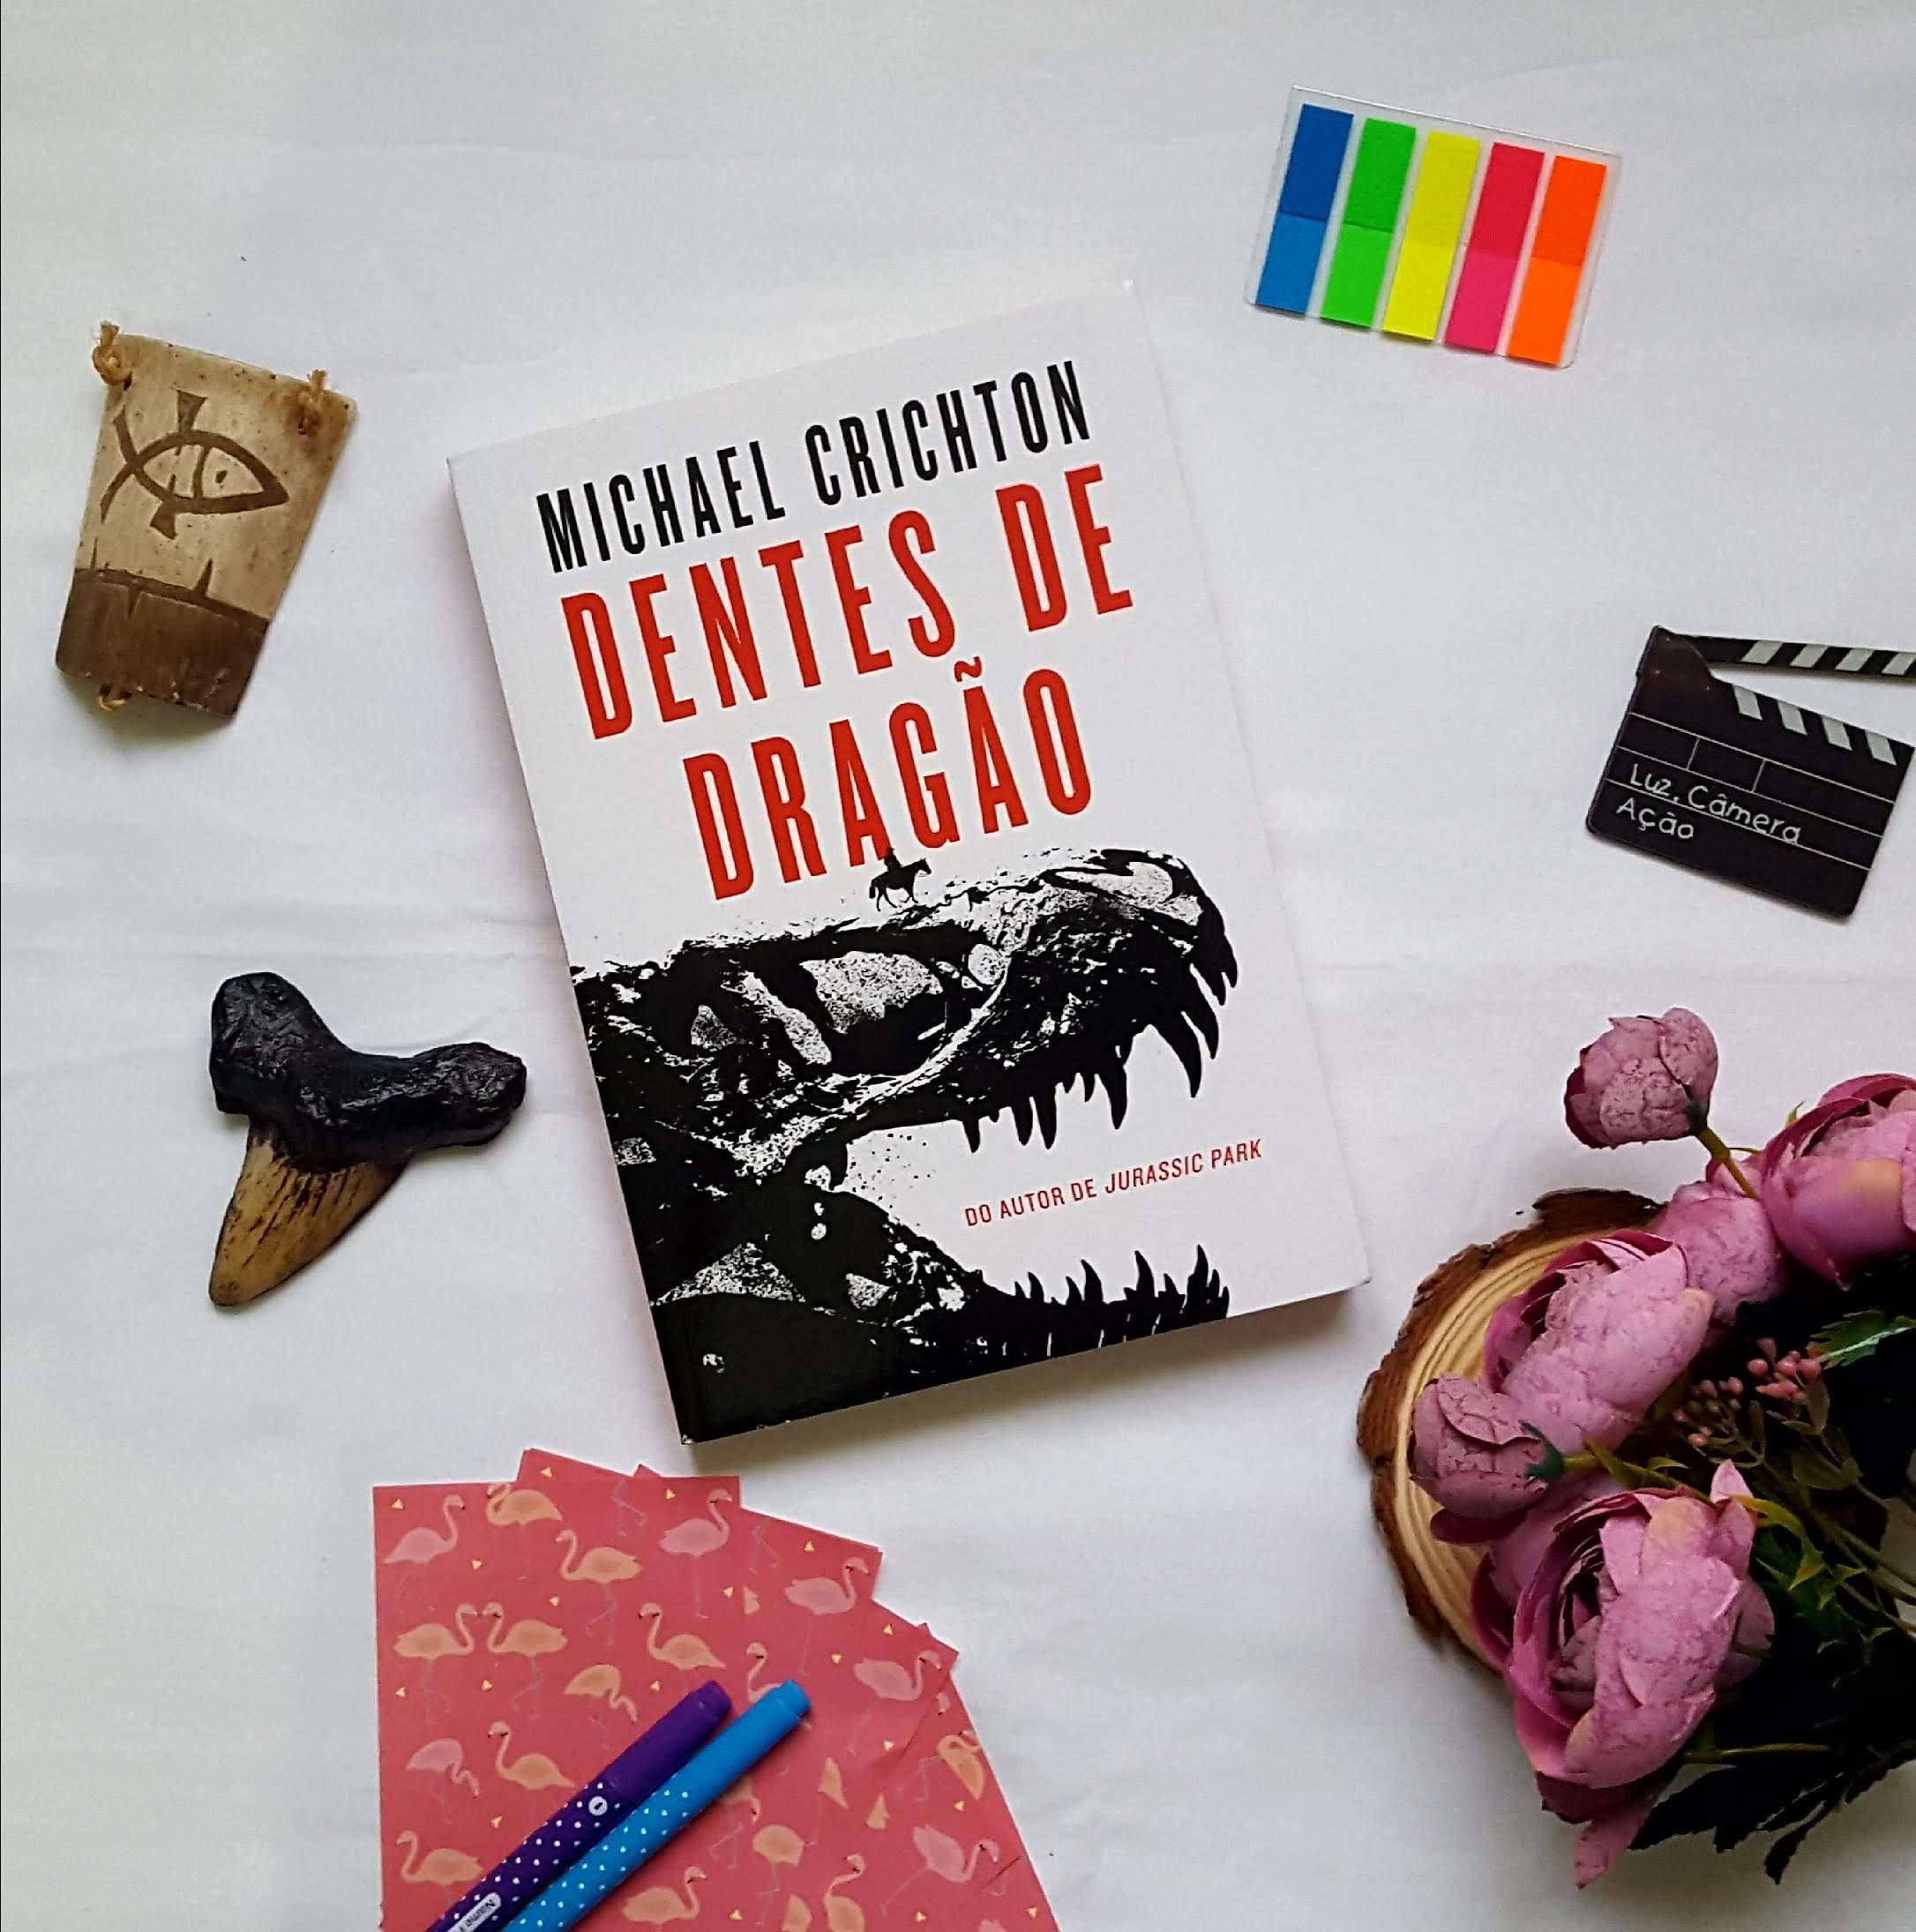 Dentes de dragão | Michael Crichton